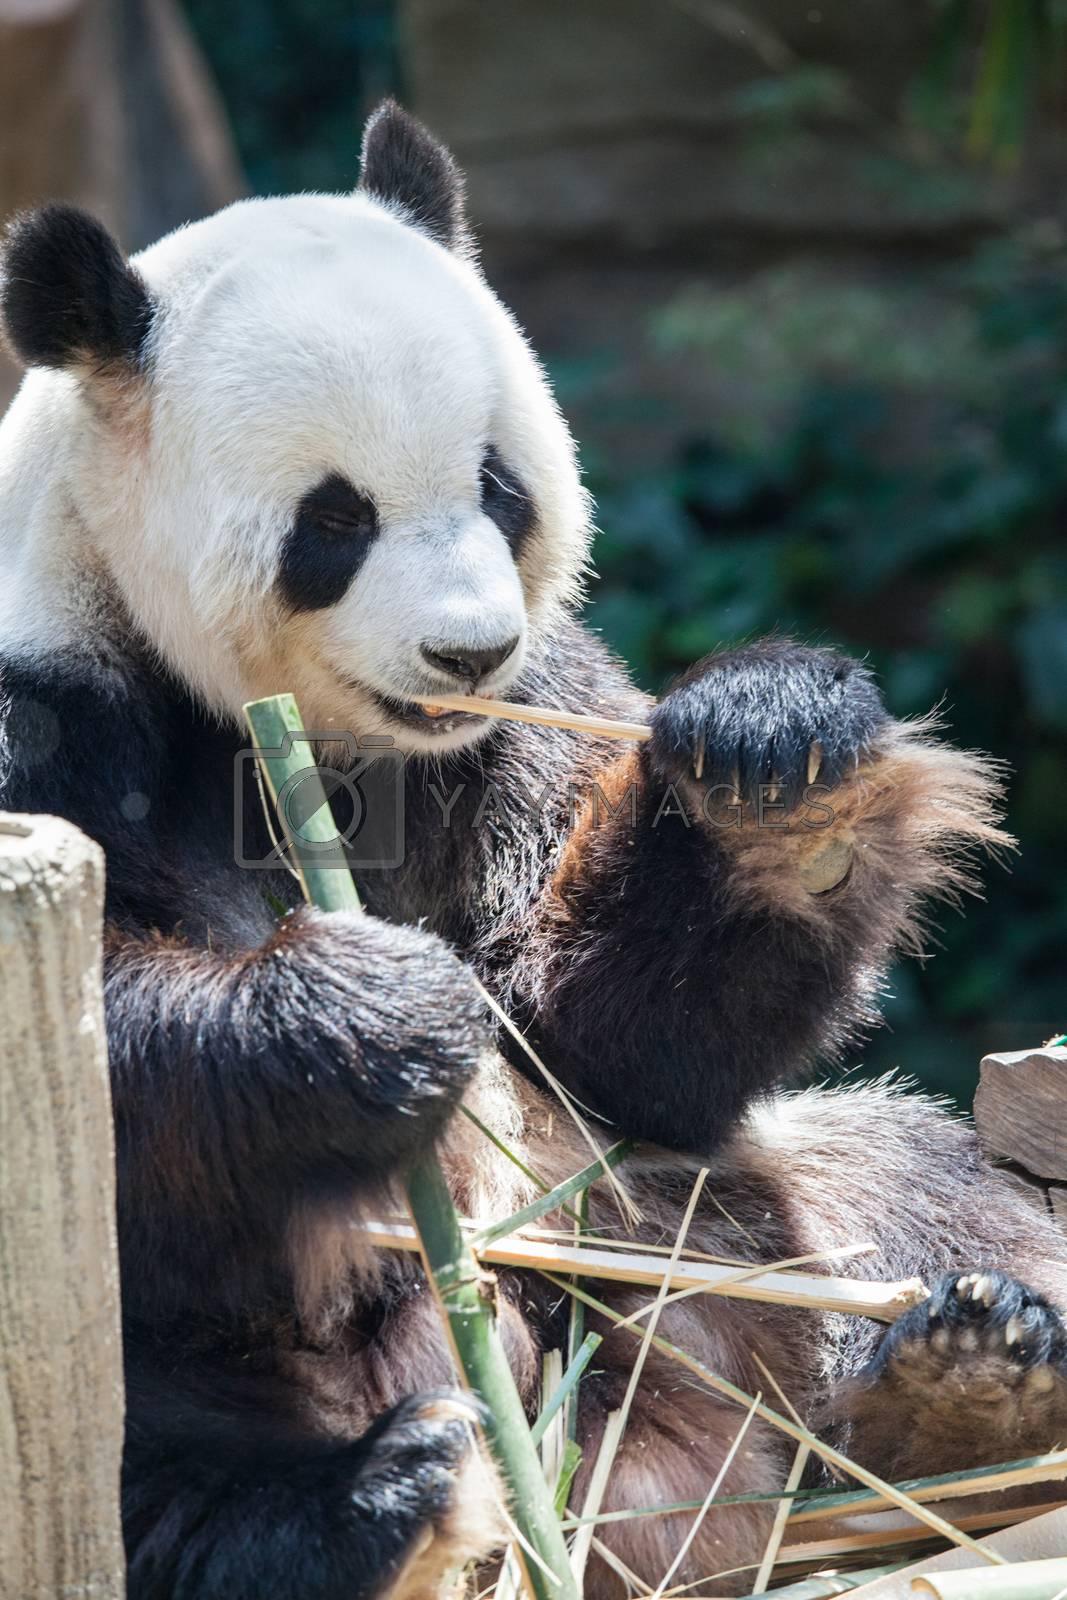 Giant panda (Ailuropoda melanoleuca). Wildlife animal. Eating bamboo